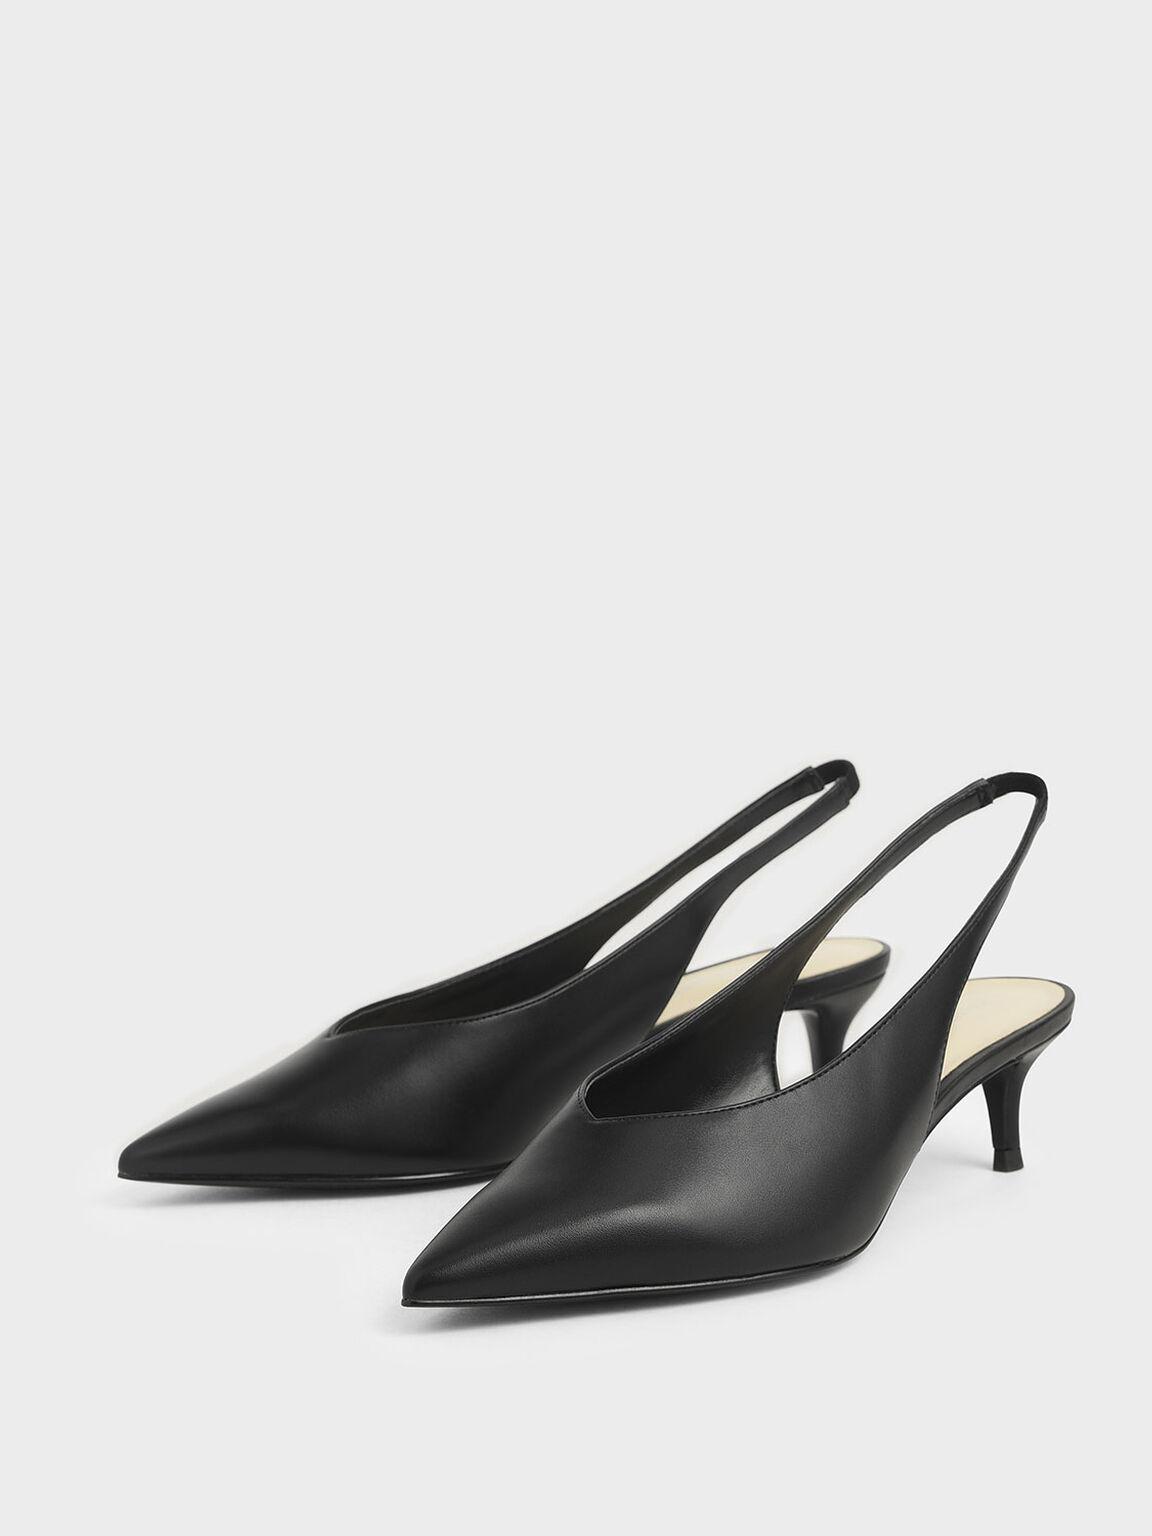 Slingback Kitten Heels, Black, hi-res